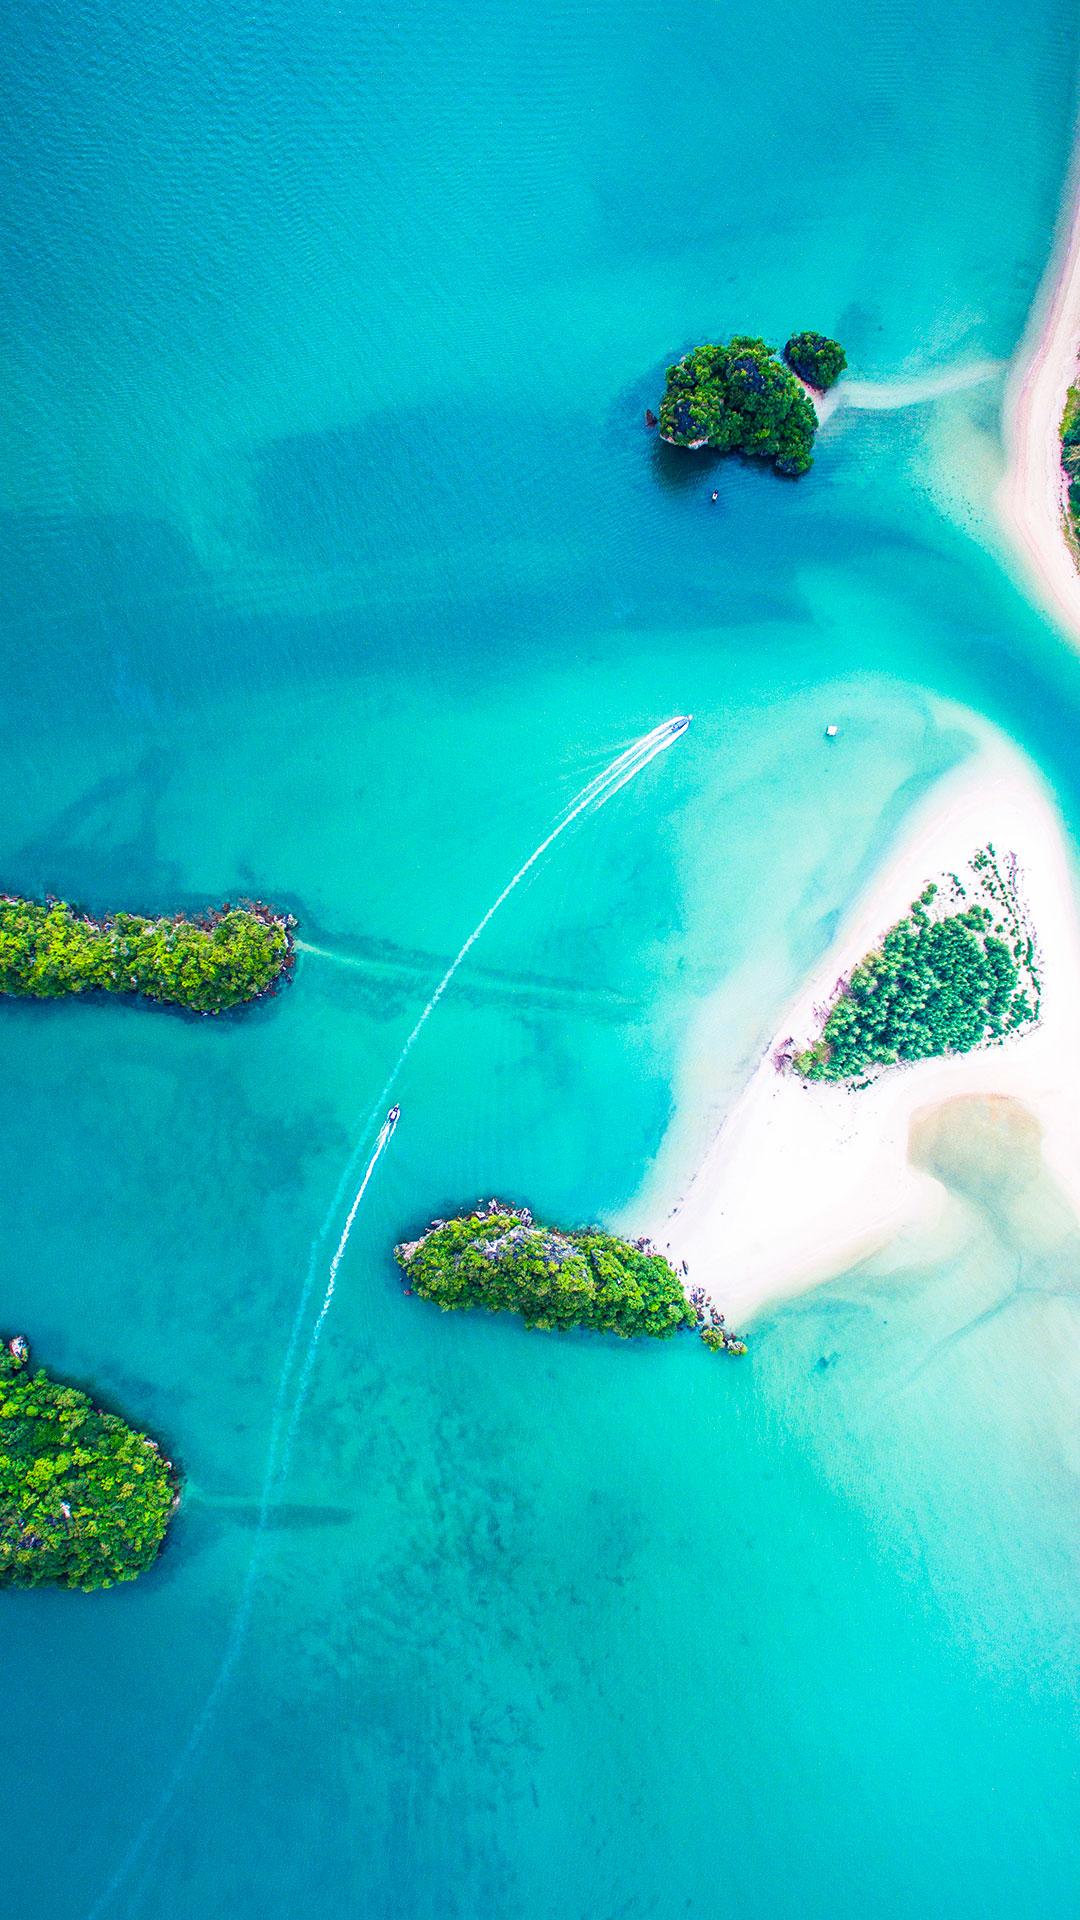 iPhone wallpaper island paradise Island